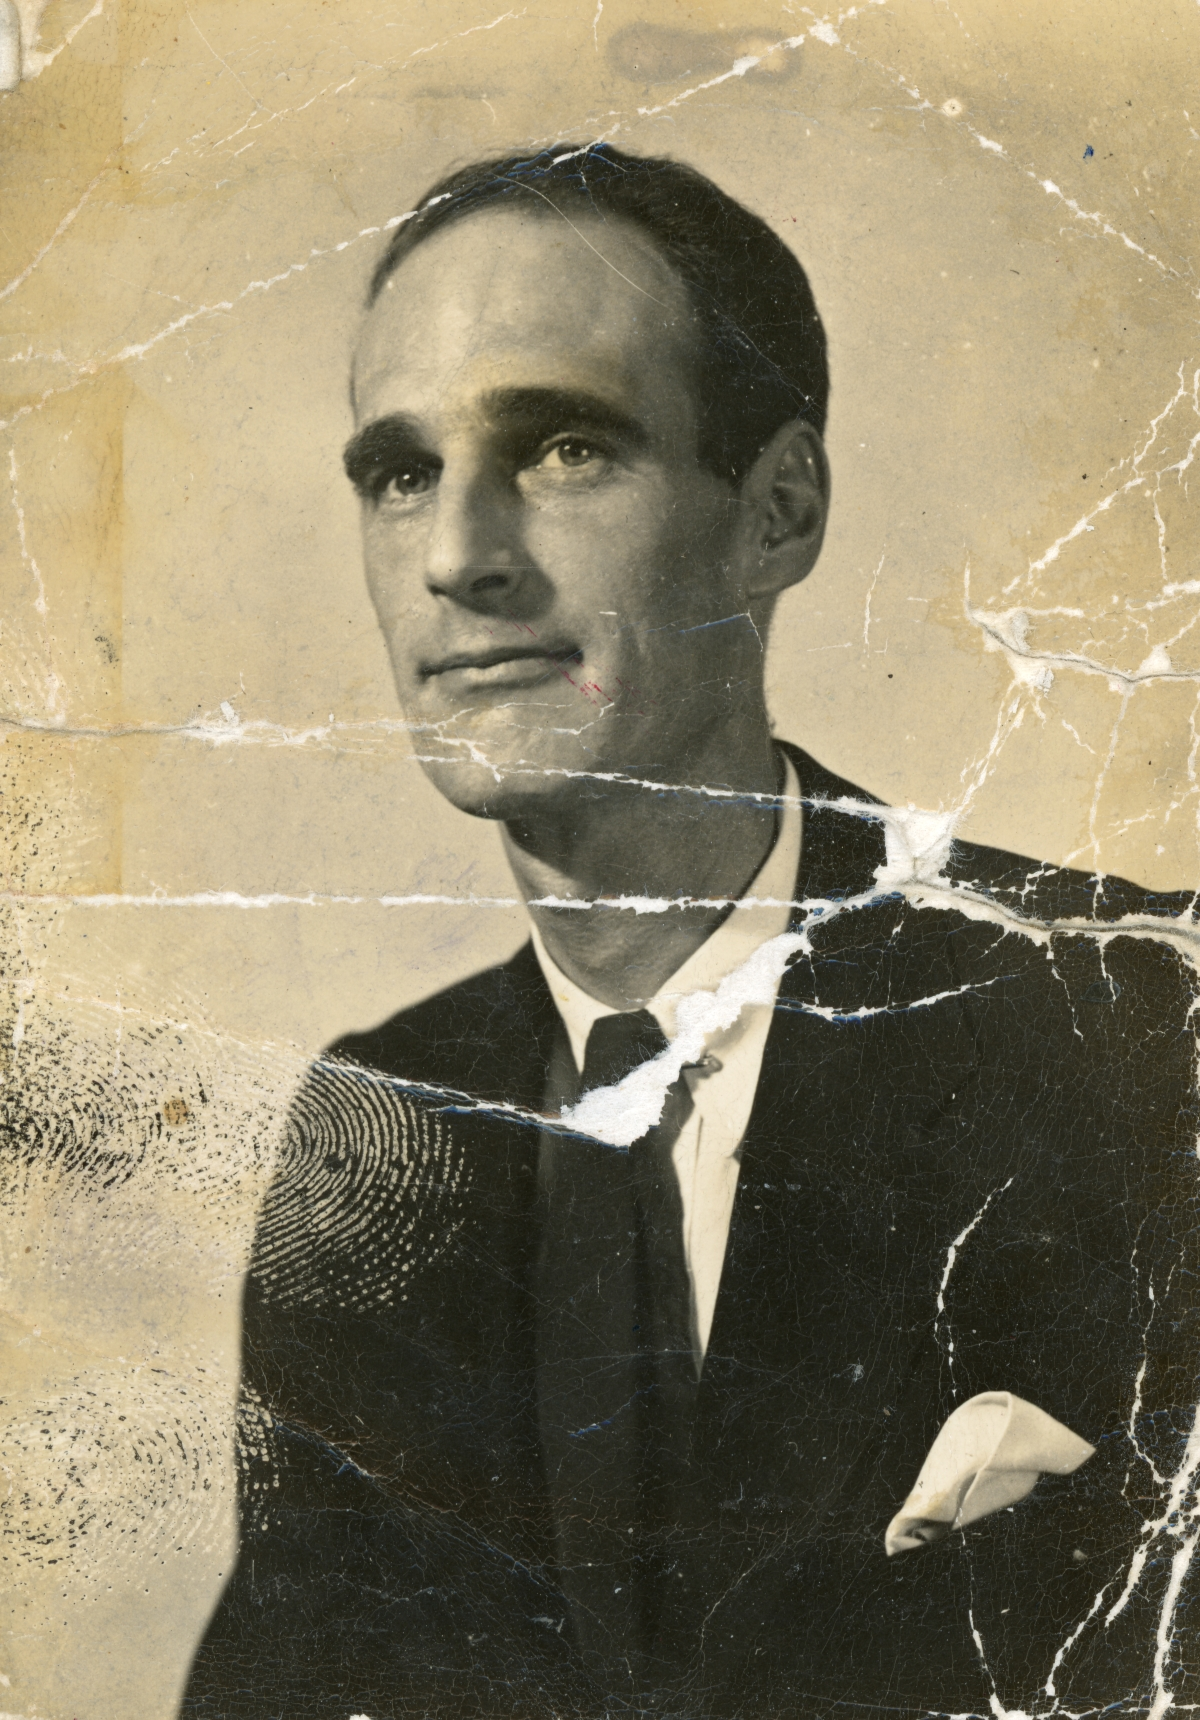 Portrait of Coleman Sweeting Dixon.